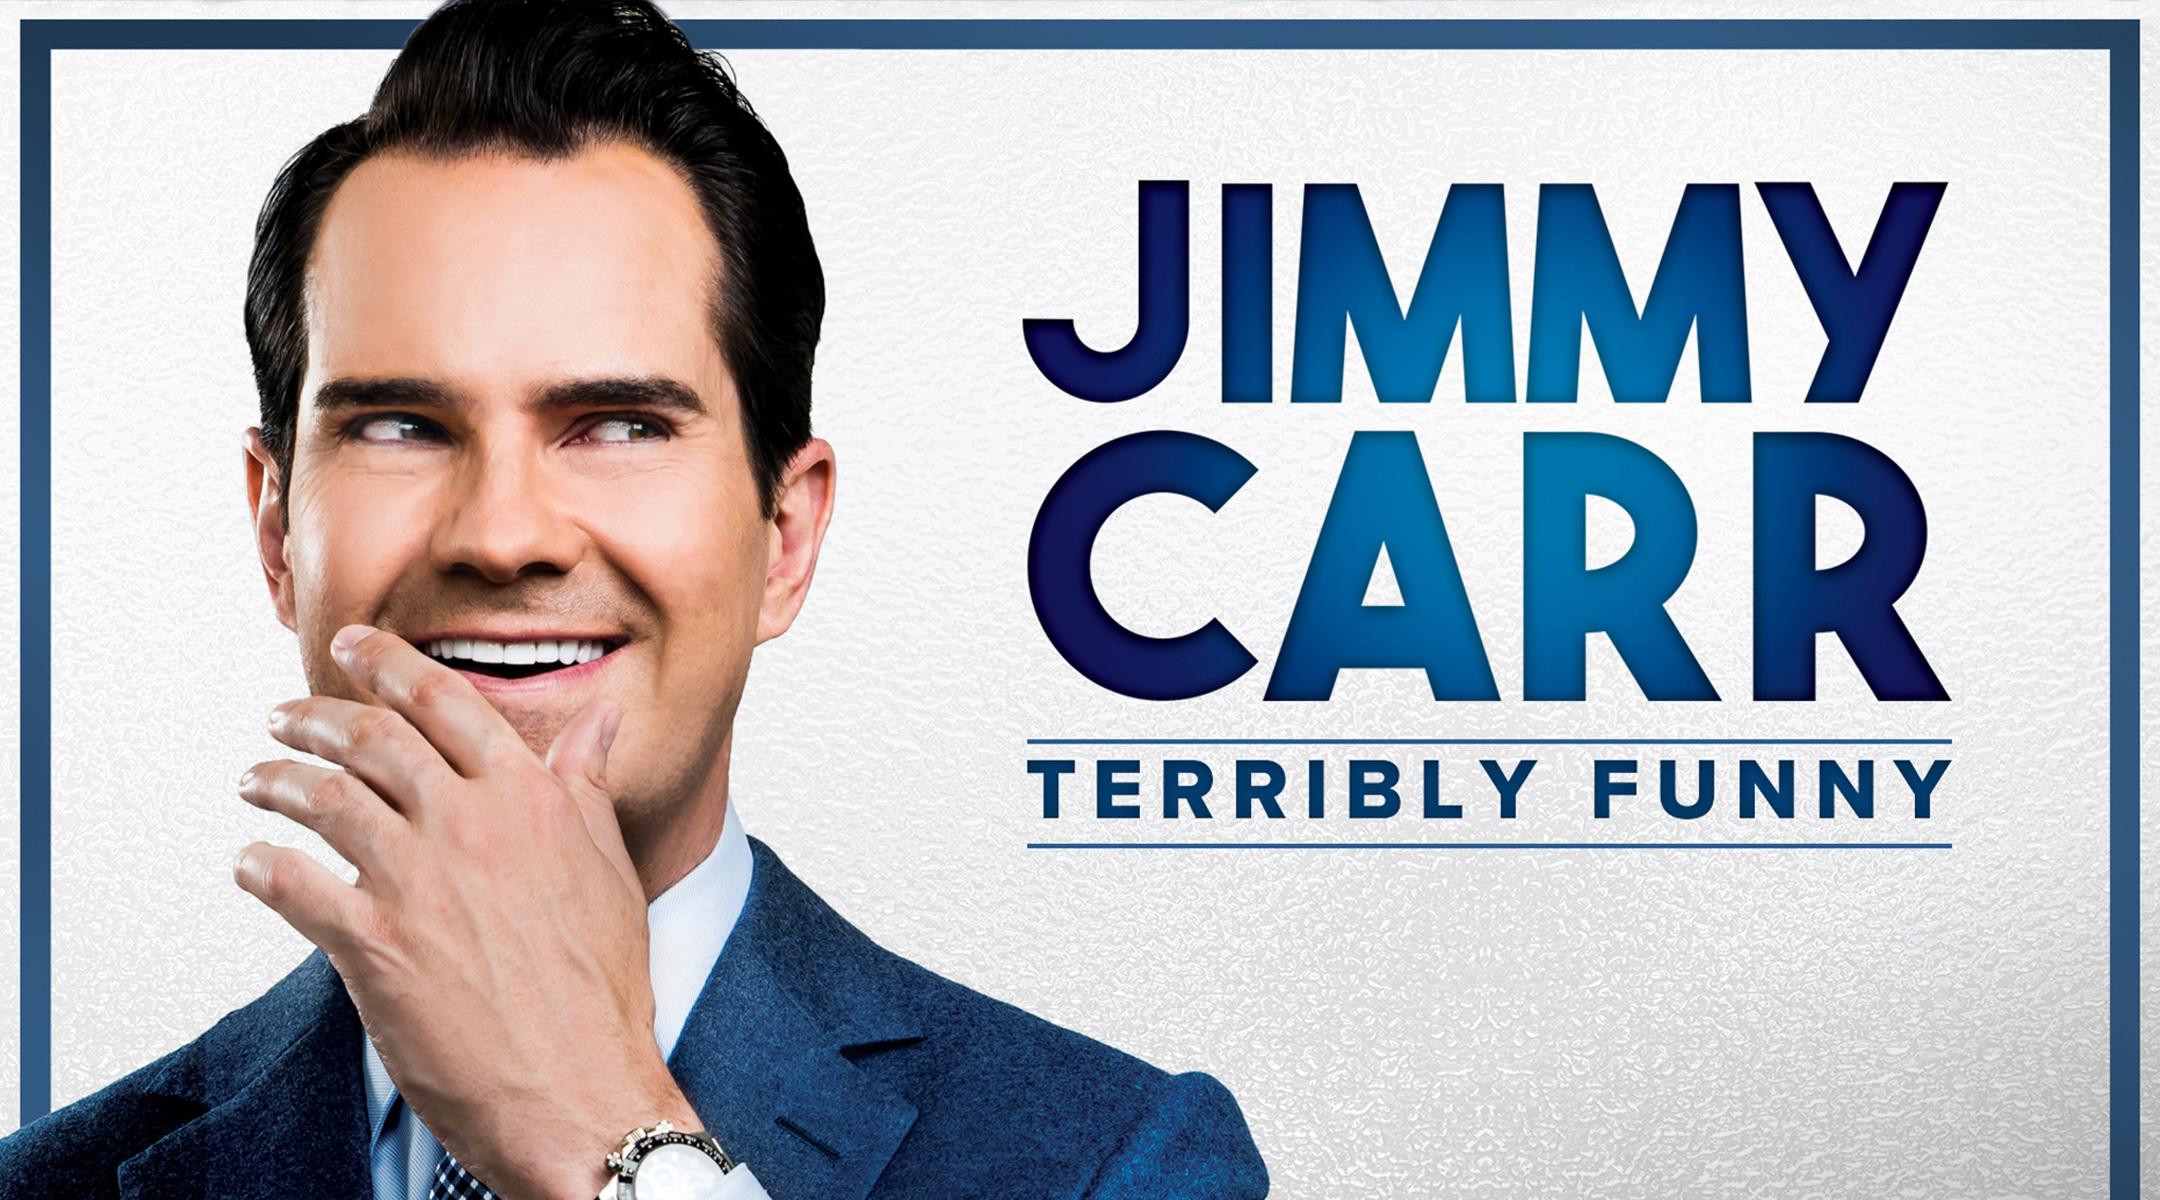 Jimmy Carr: Terribly Funny - Barnstaple Late show